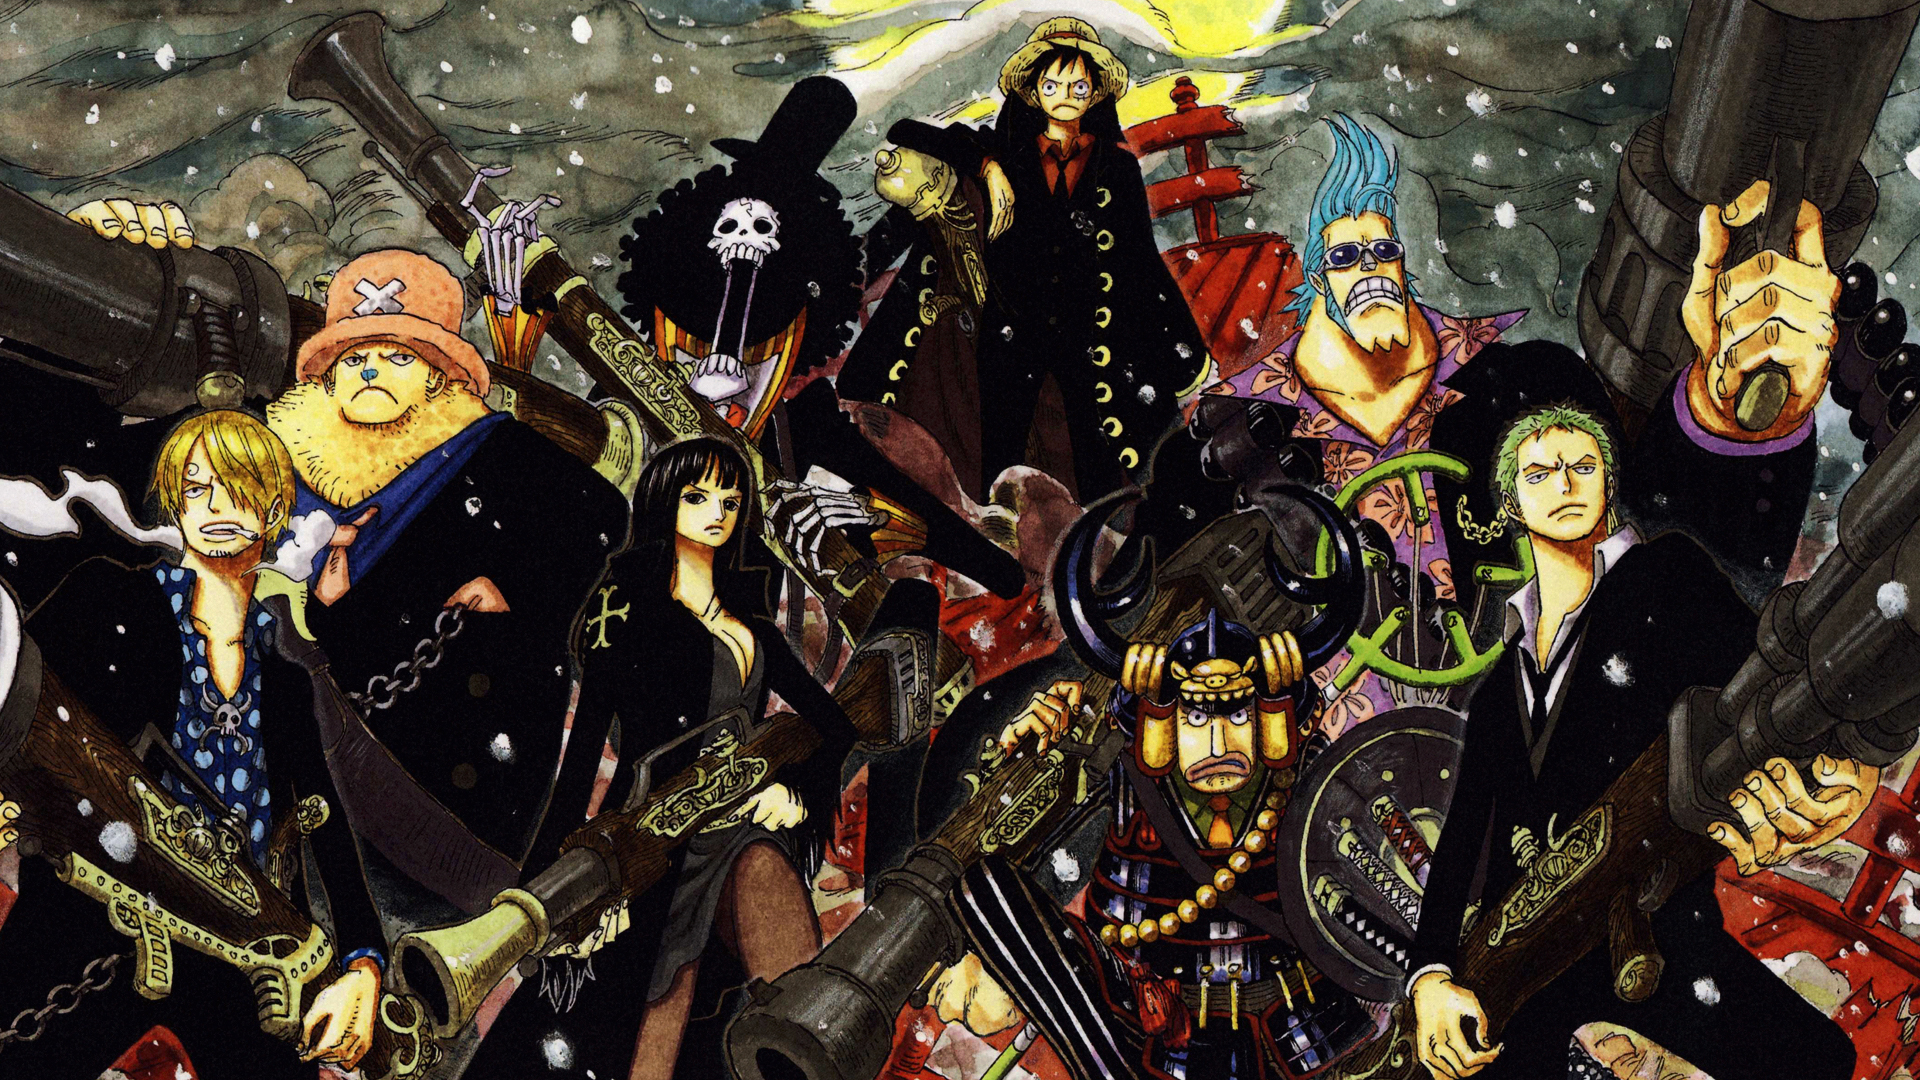 Hd wallpaper one piece zoro - Strong World Download Strong World Image 91 Fav One Piece